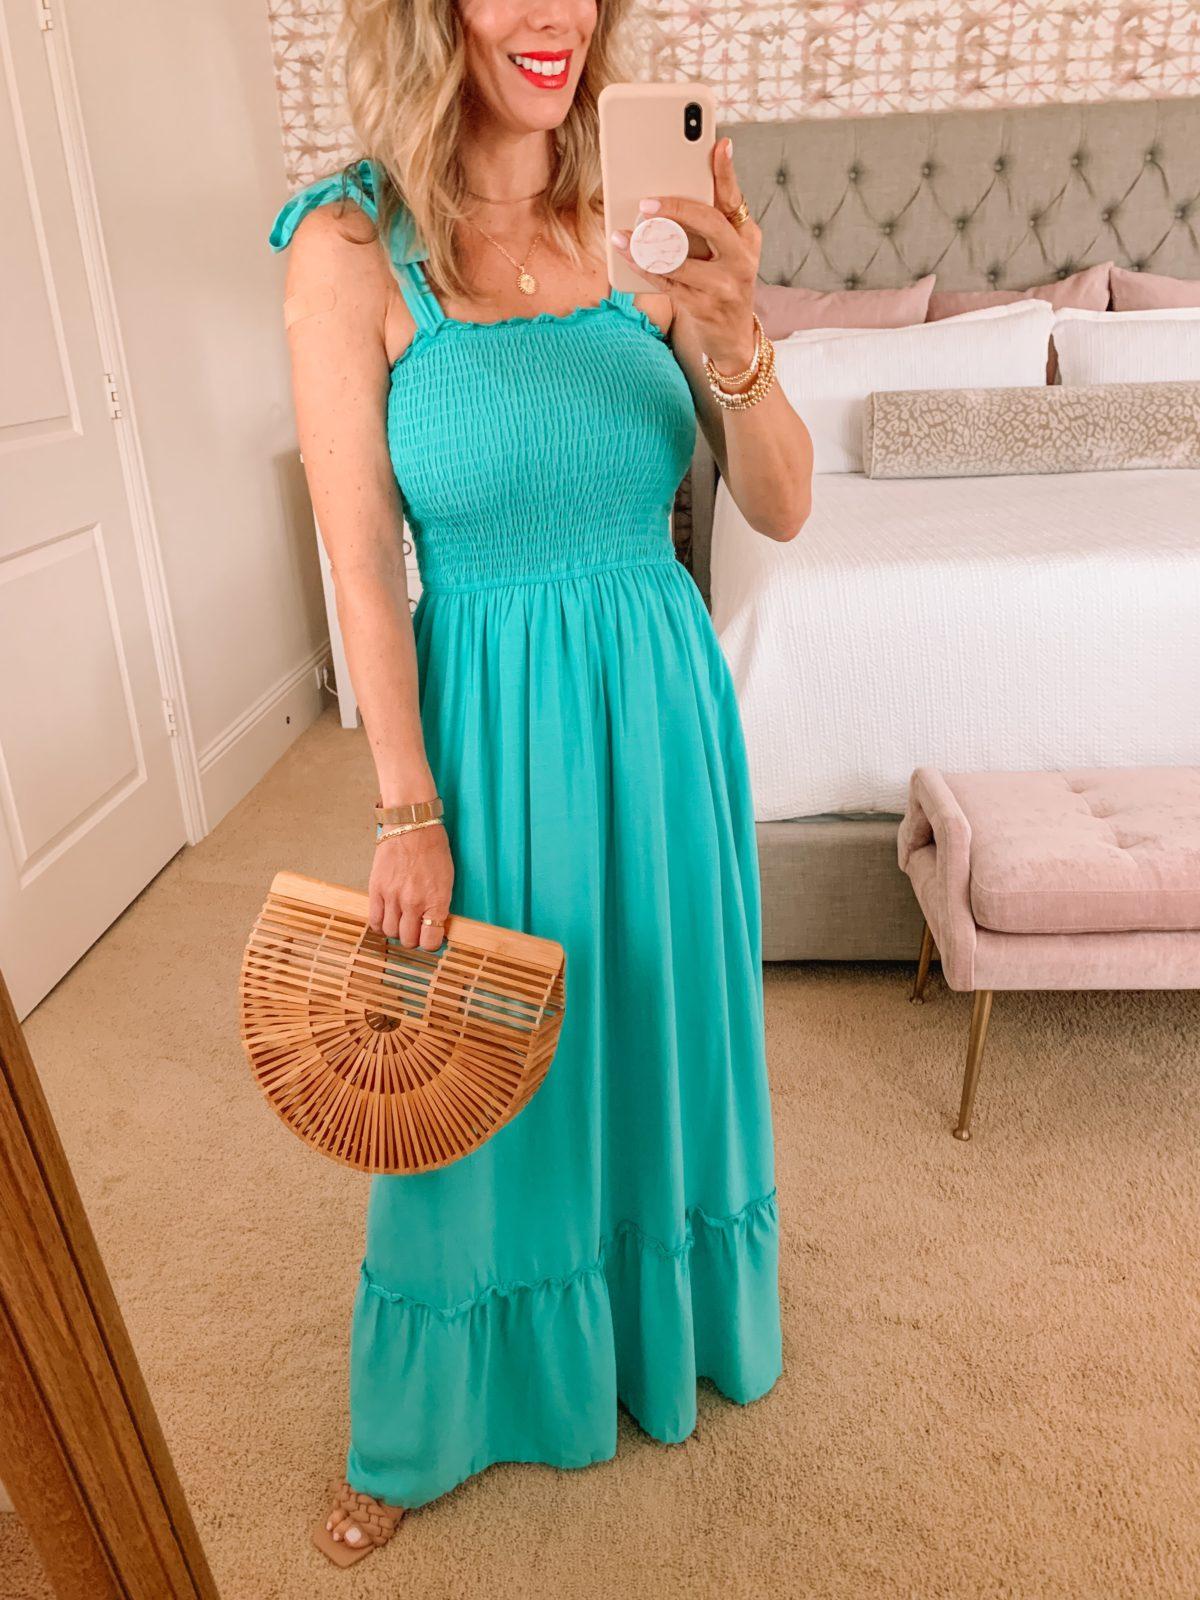 Amazon Fashion Faves, Teal Maxi Dress, Clutch